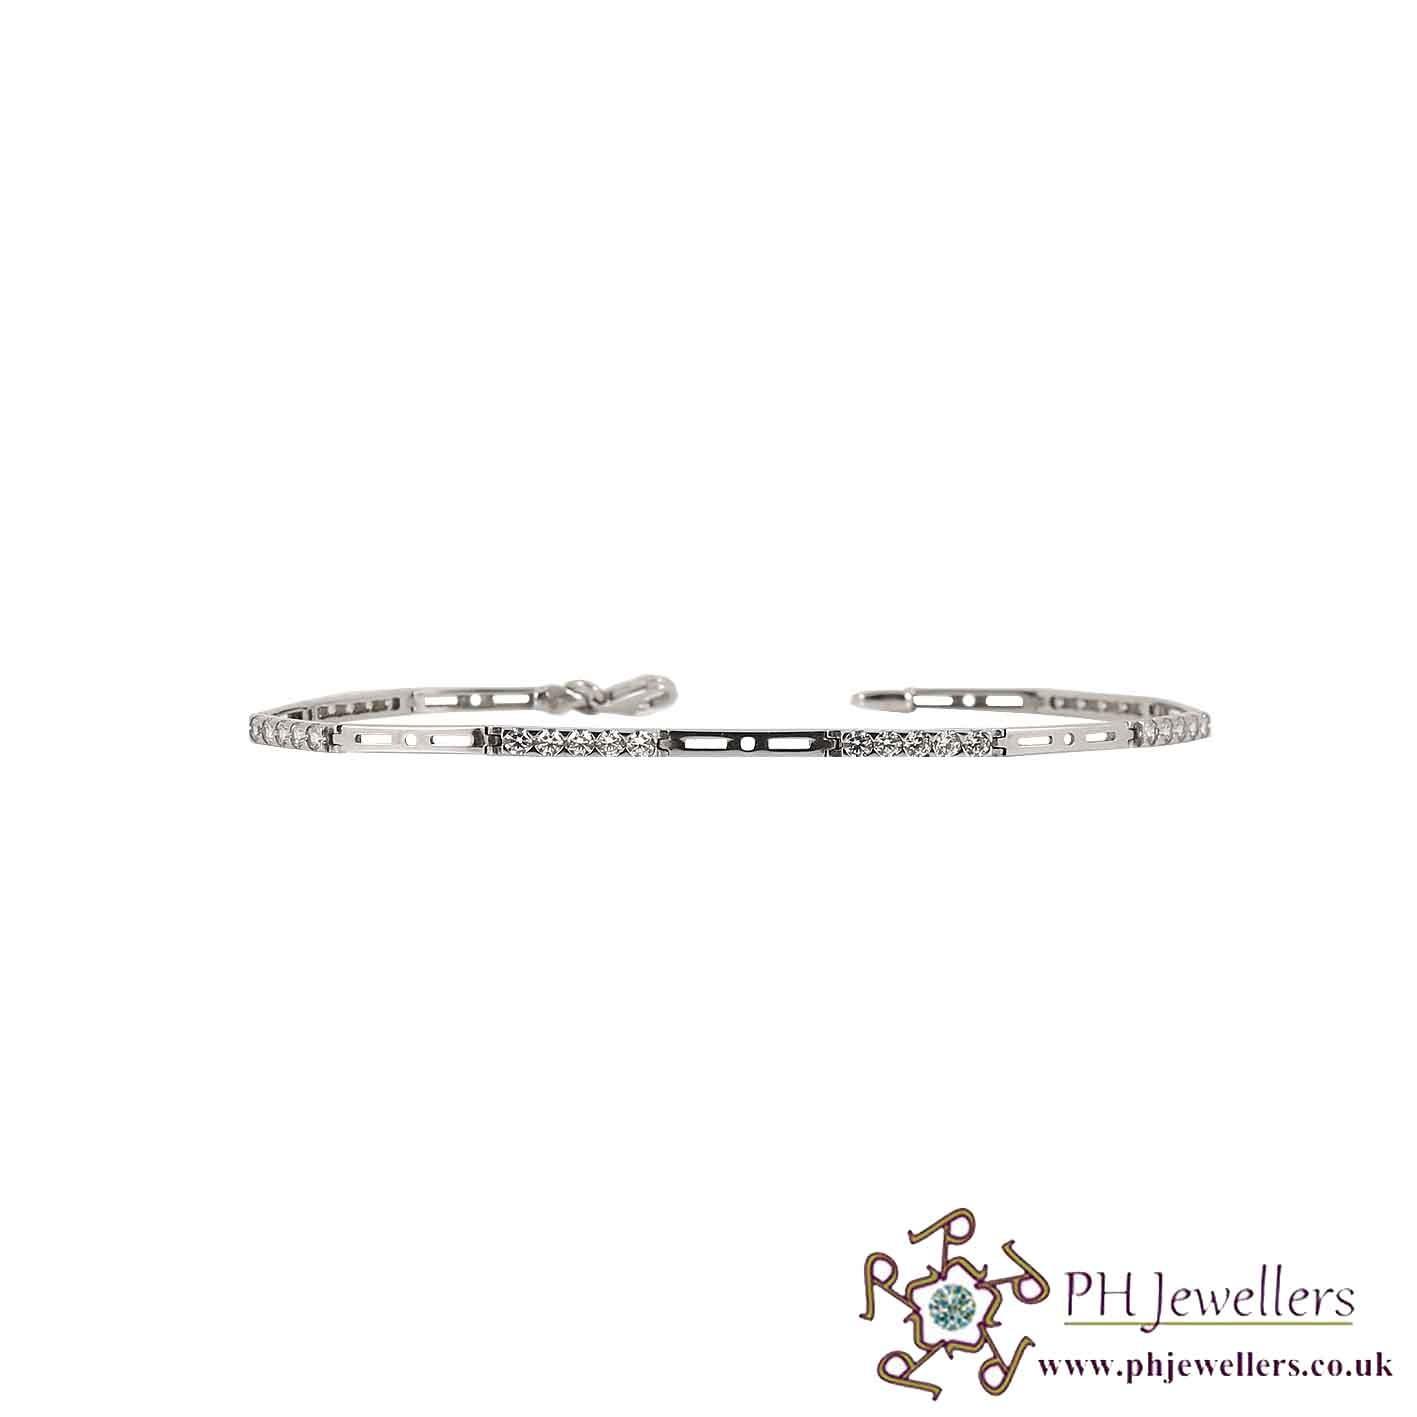 18CT 750 Hallmark White Gold Bracelet CZ WGLB9